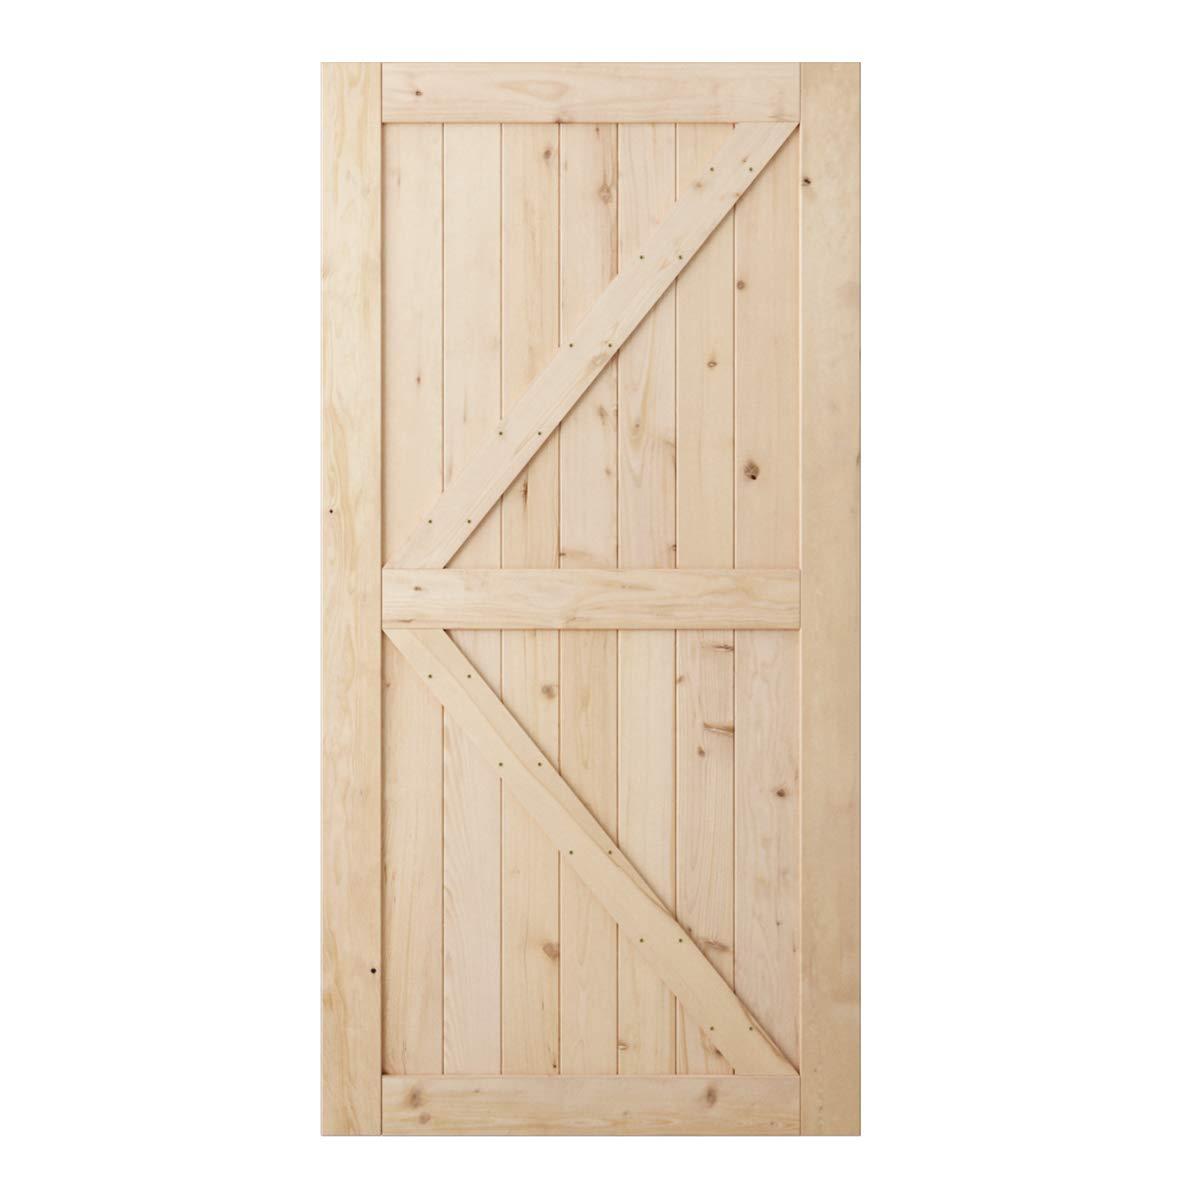 SmartStandard 42in x 84in Sliding Barn Wood Door Pre-Drilled Ready to Assemble, DIY Unfinished Solid Hemlock Wood Panelled Slab, Interior Single Door Only, Natural, K-Frame